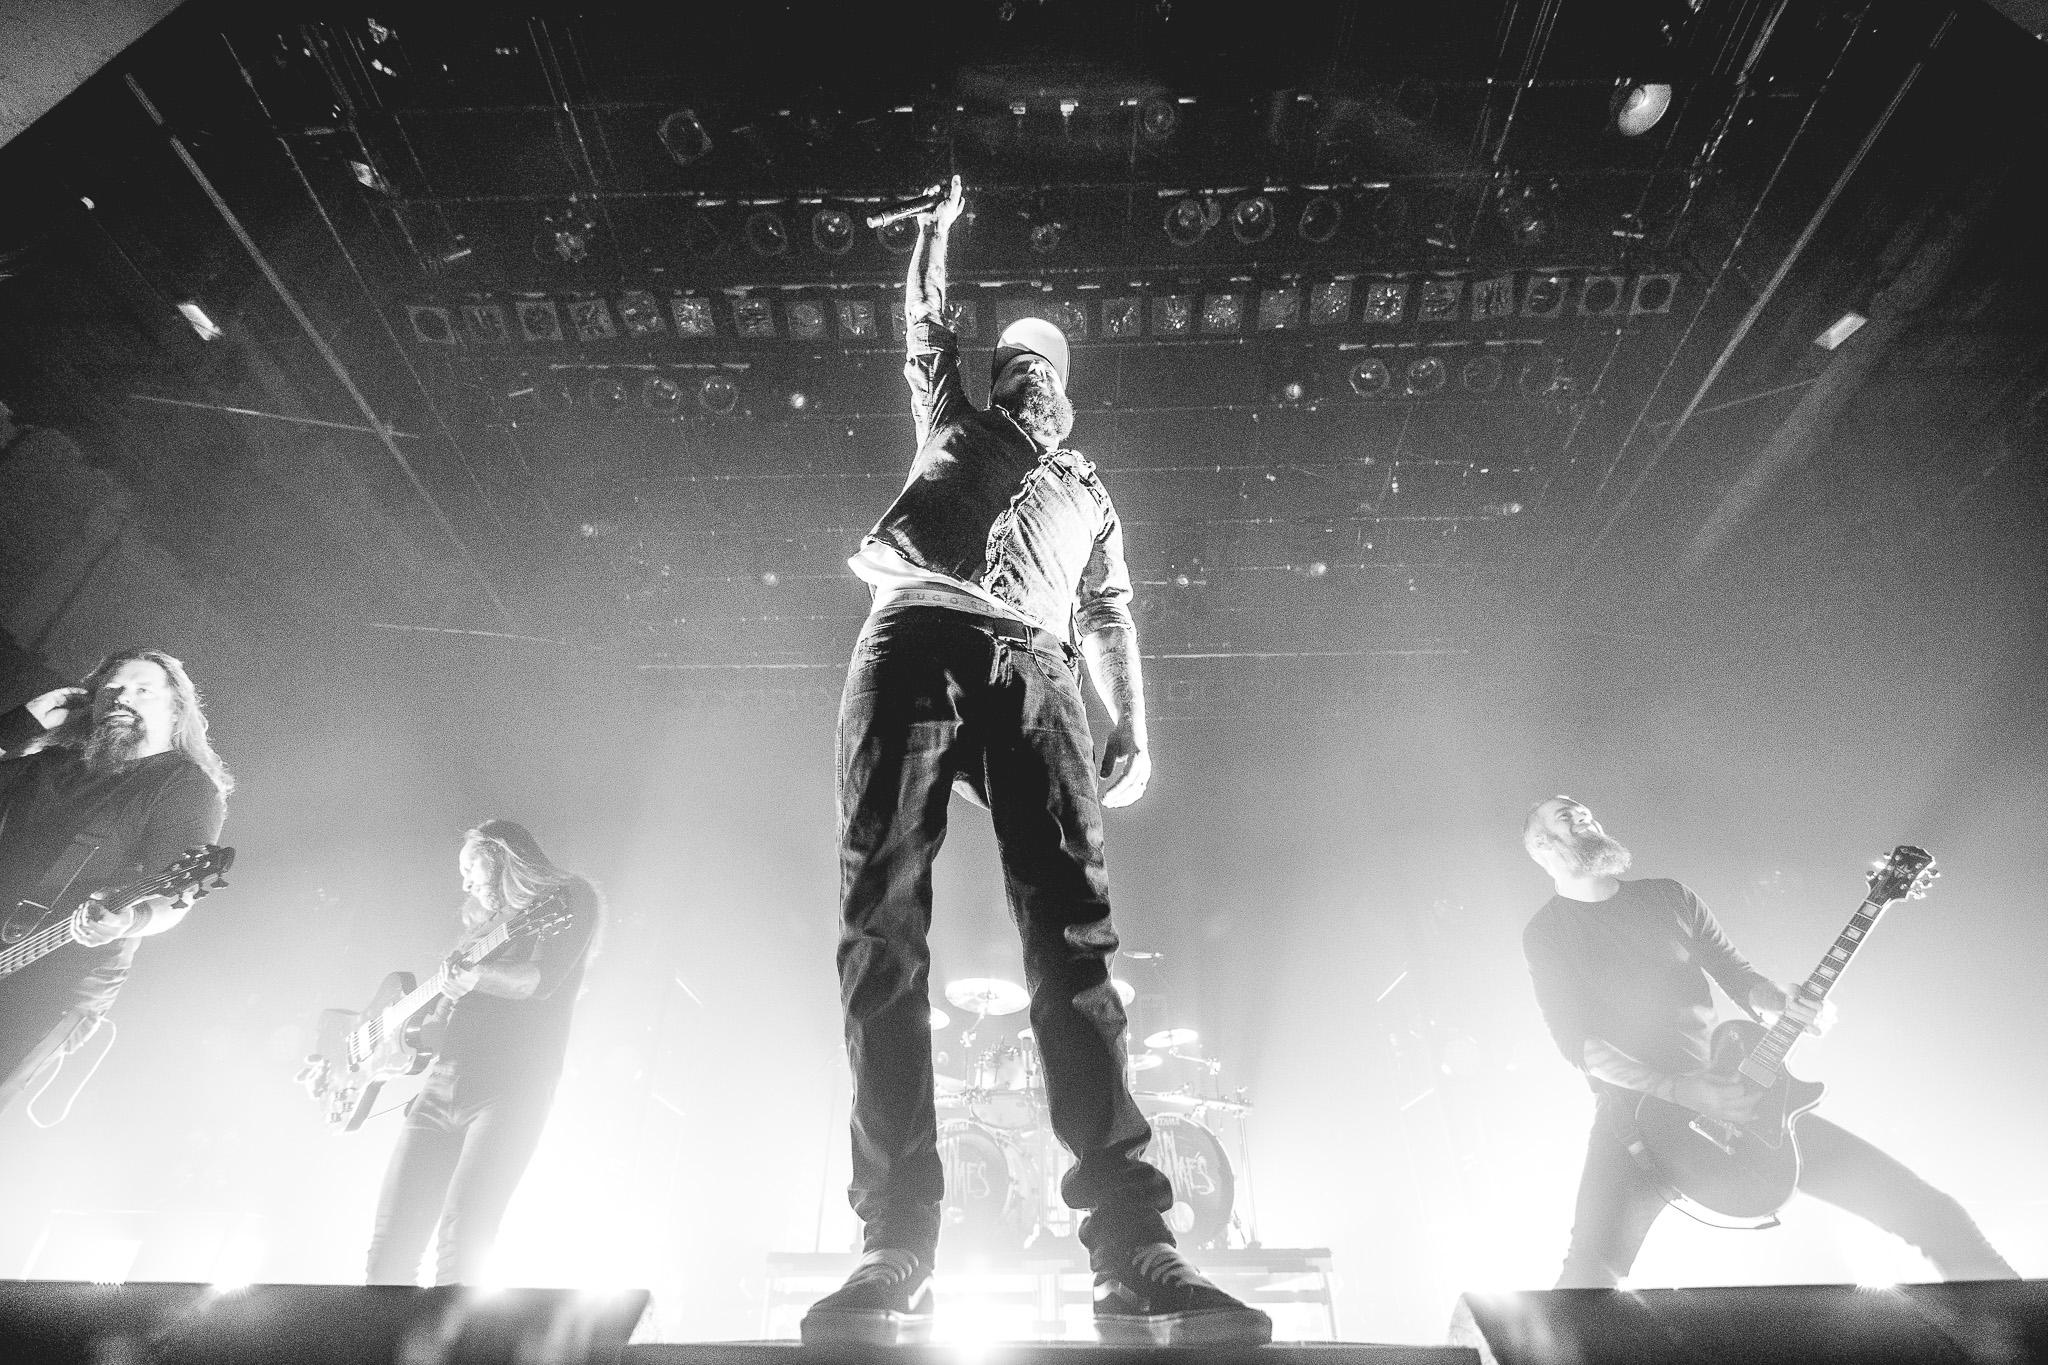 Critique-concert-Opeth-and-In-Flames-Metropolis-de-Montreal-samedi-20-decembre-2014_01